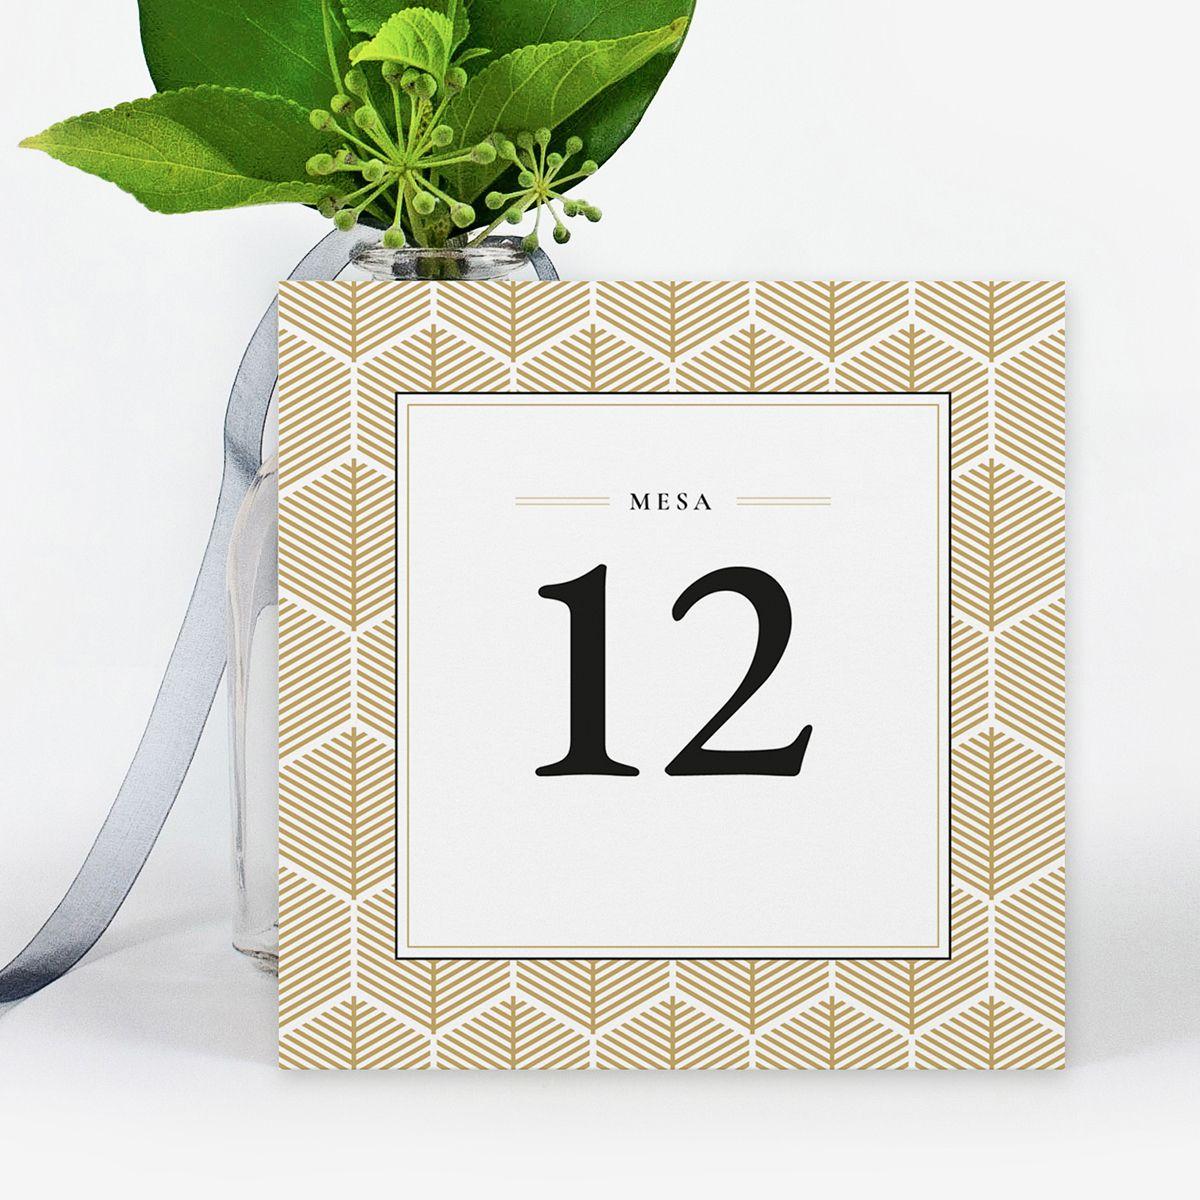 Número mesa boda Reins Ocre